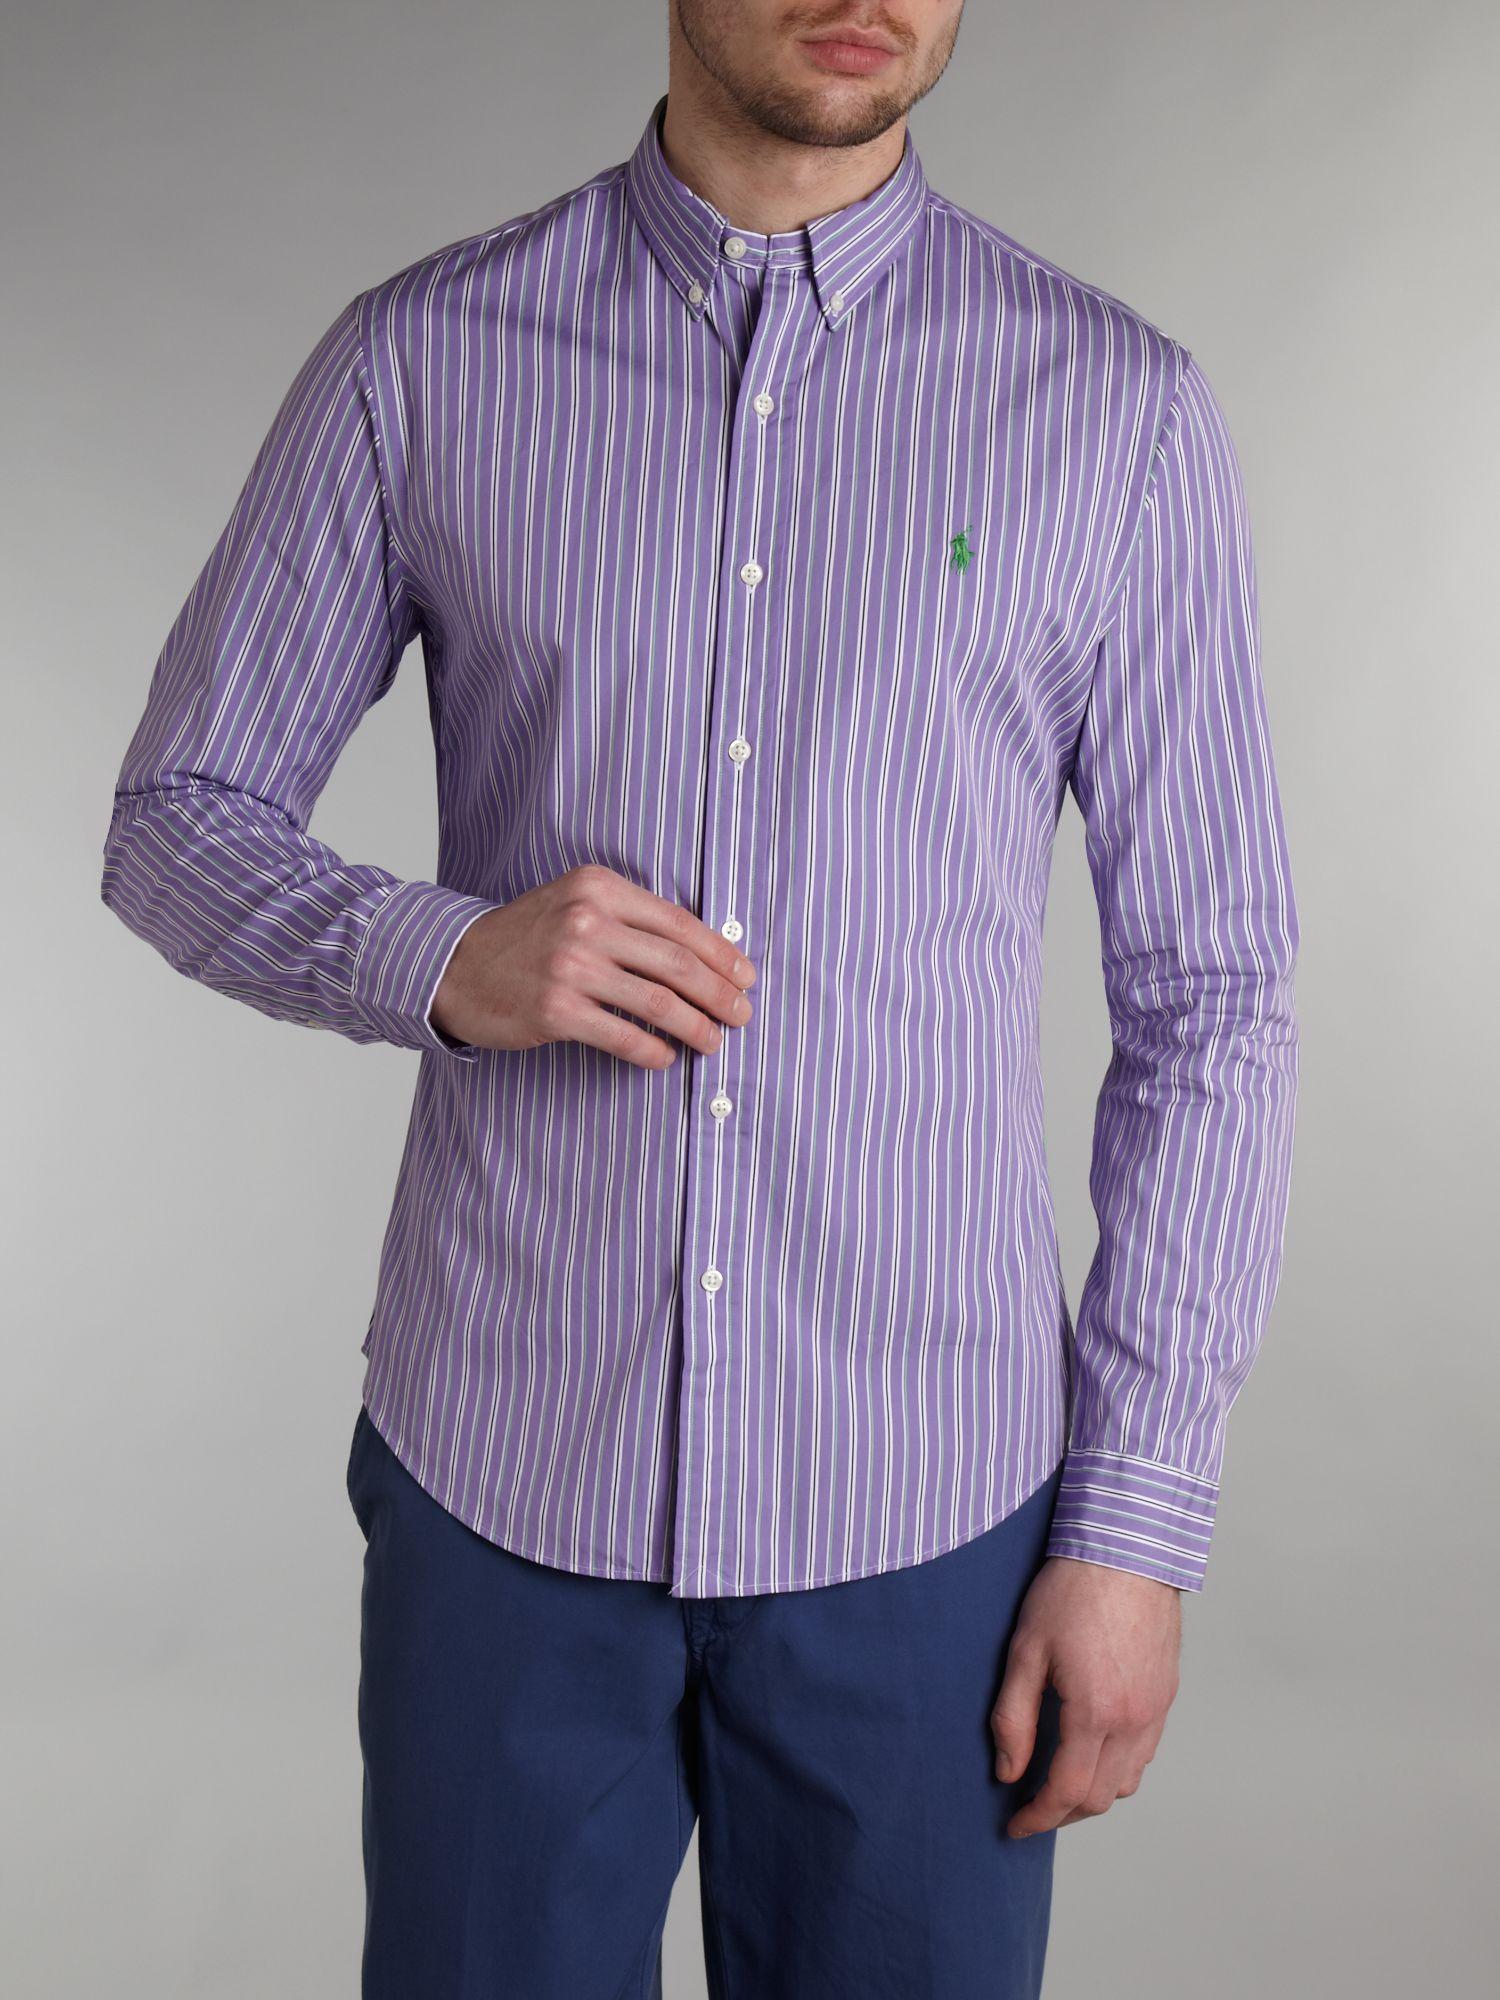 Polo ralph lauren long sleeved gingham shirt in purple for for Long sleeve purple polo shirt